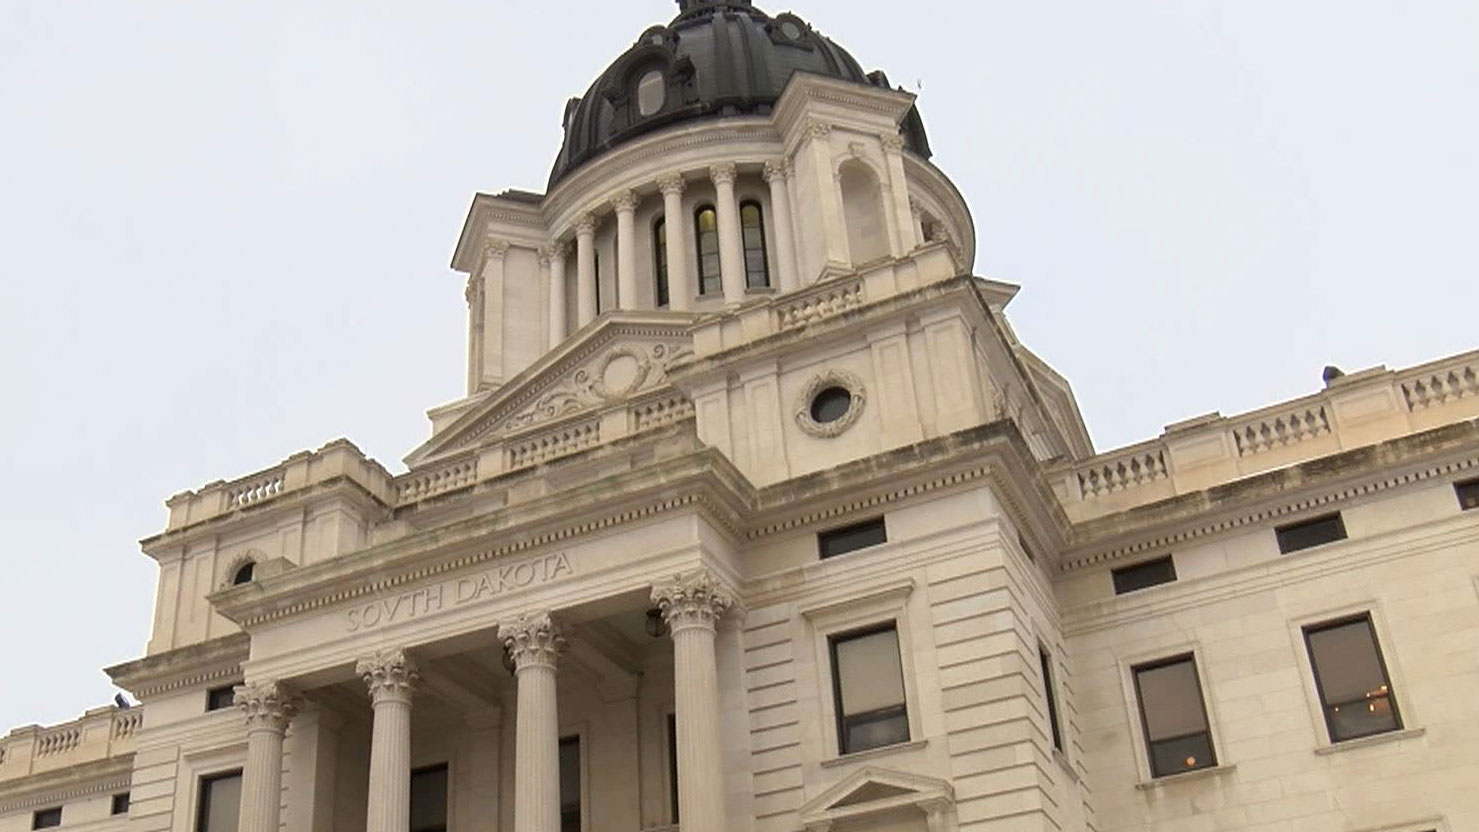 KELO Gear Up Pierre Capitol Building